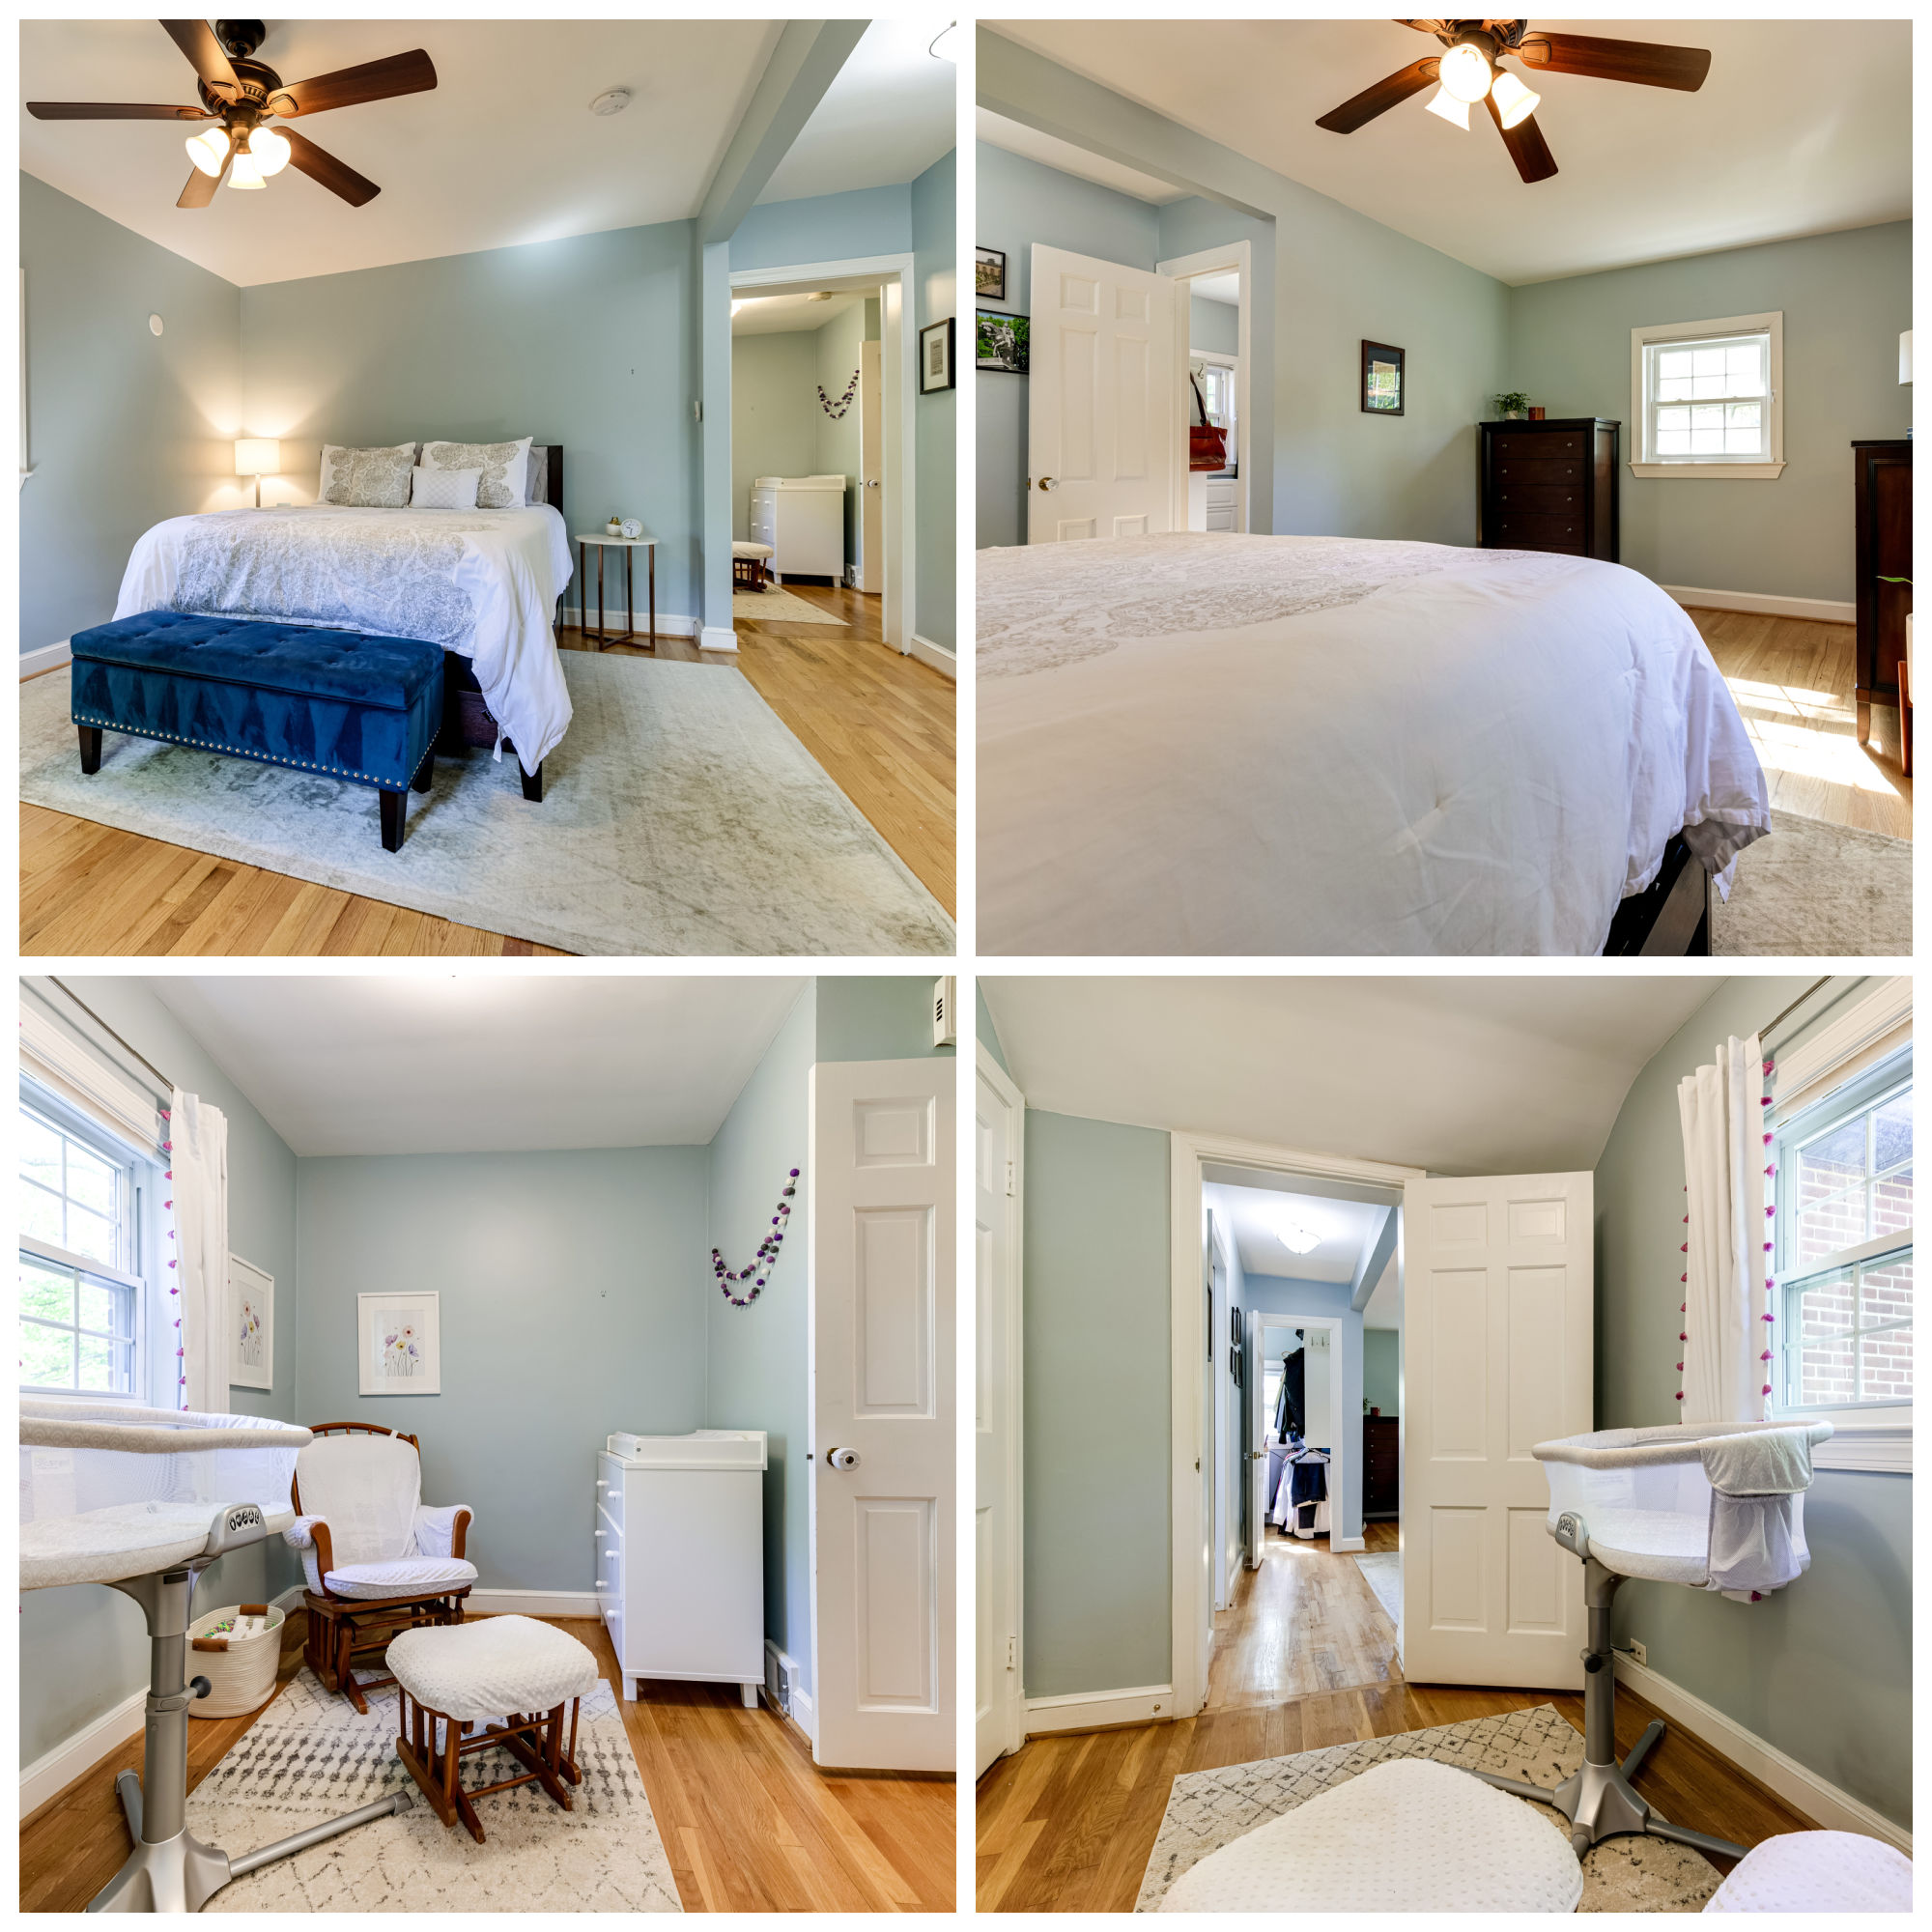 167 N Columbus St, Arlington- Primary Suite